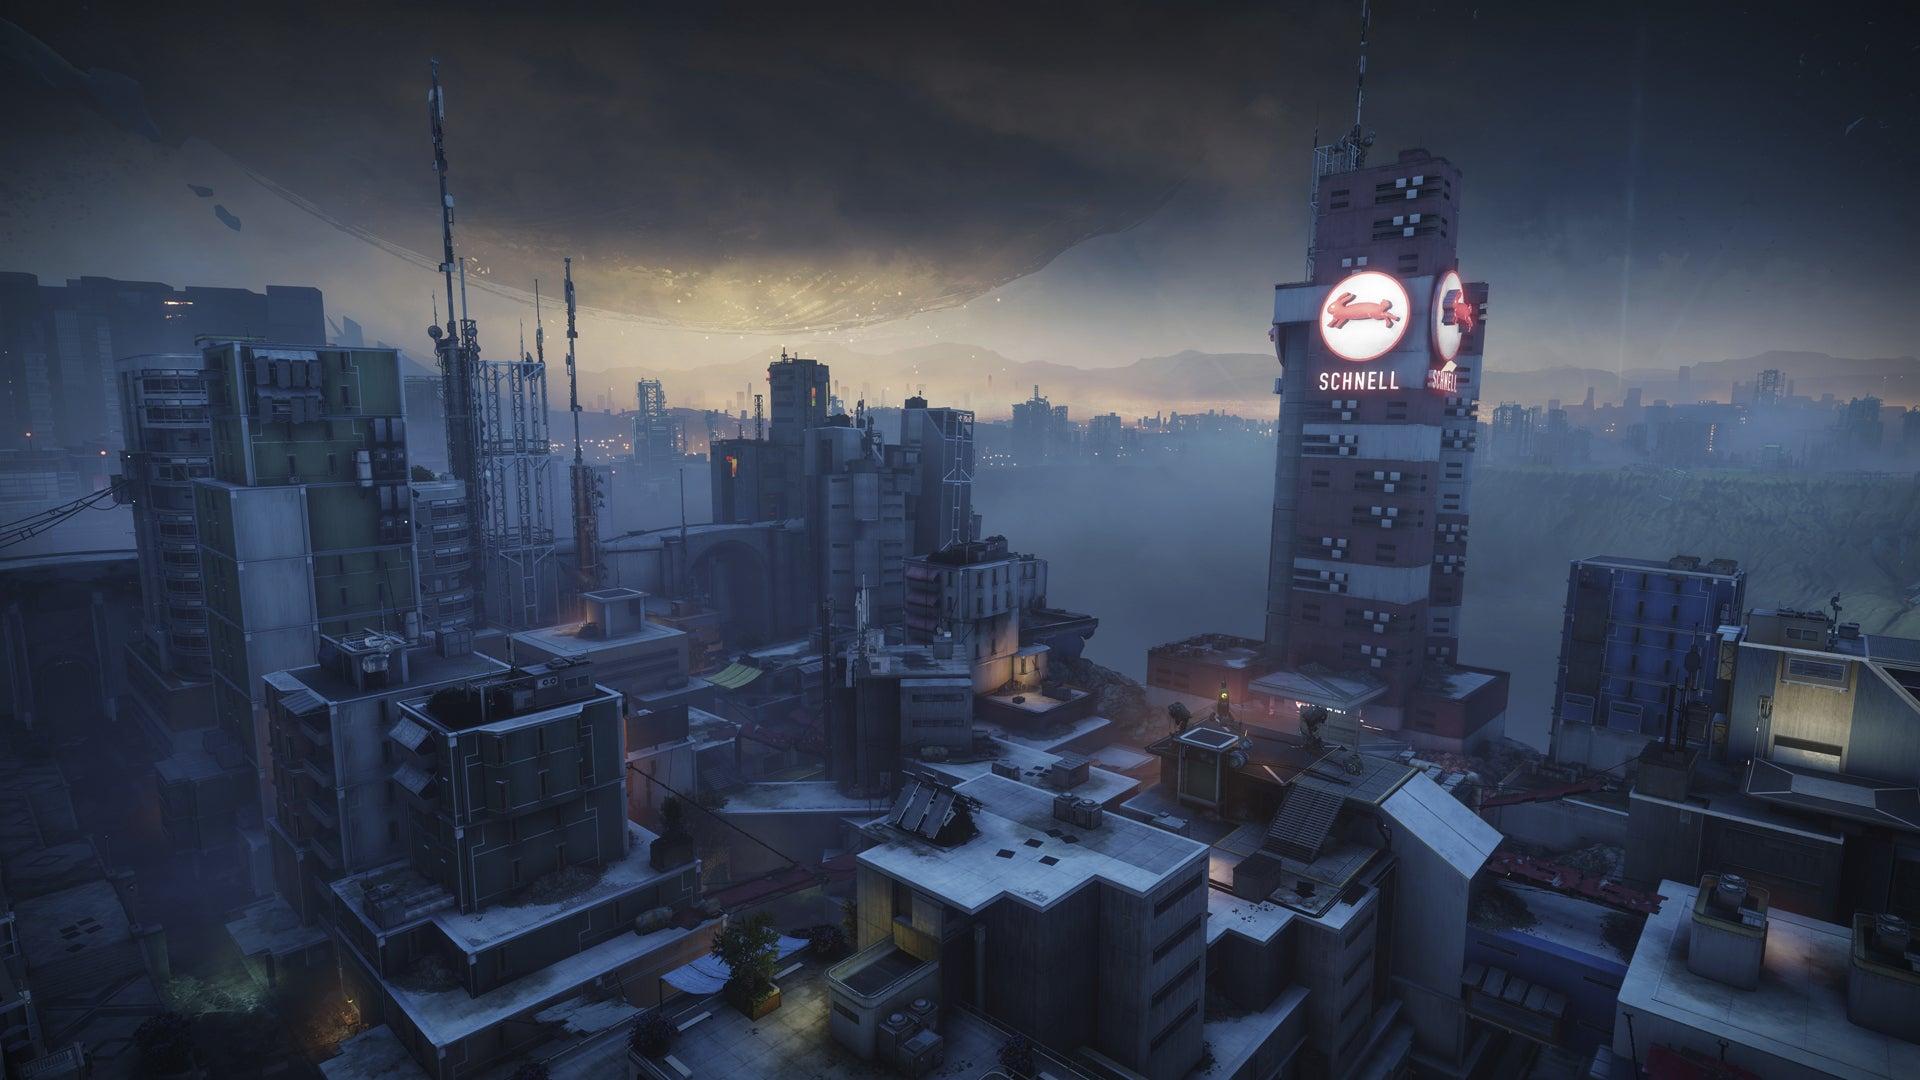 Image for Destiny 2: Potential story spoiler leaked in Black Armory cutscene